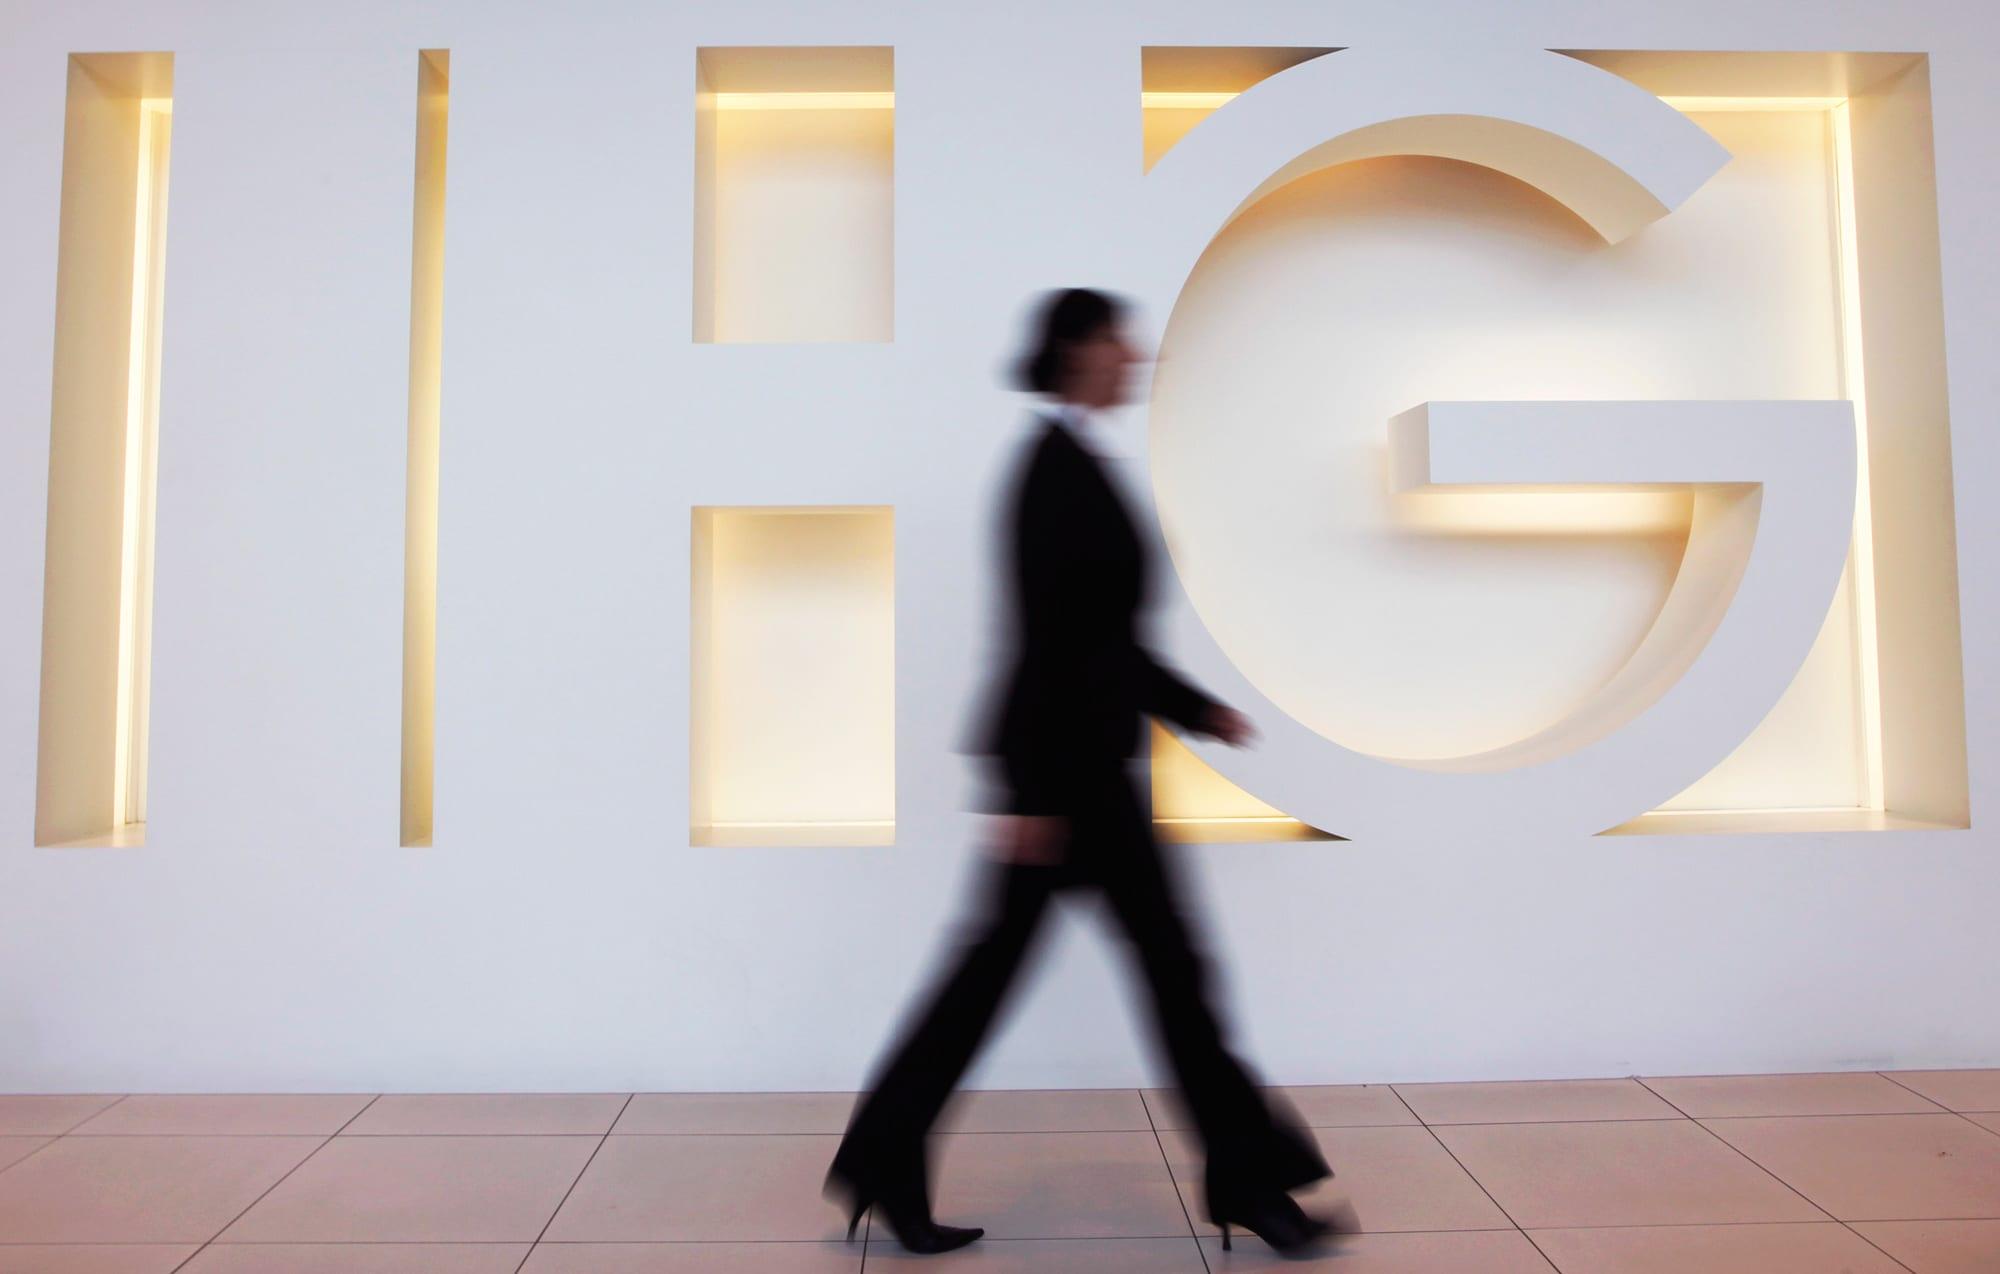 IHG full-year room revenue grows on China demand